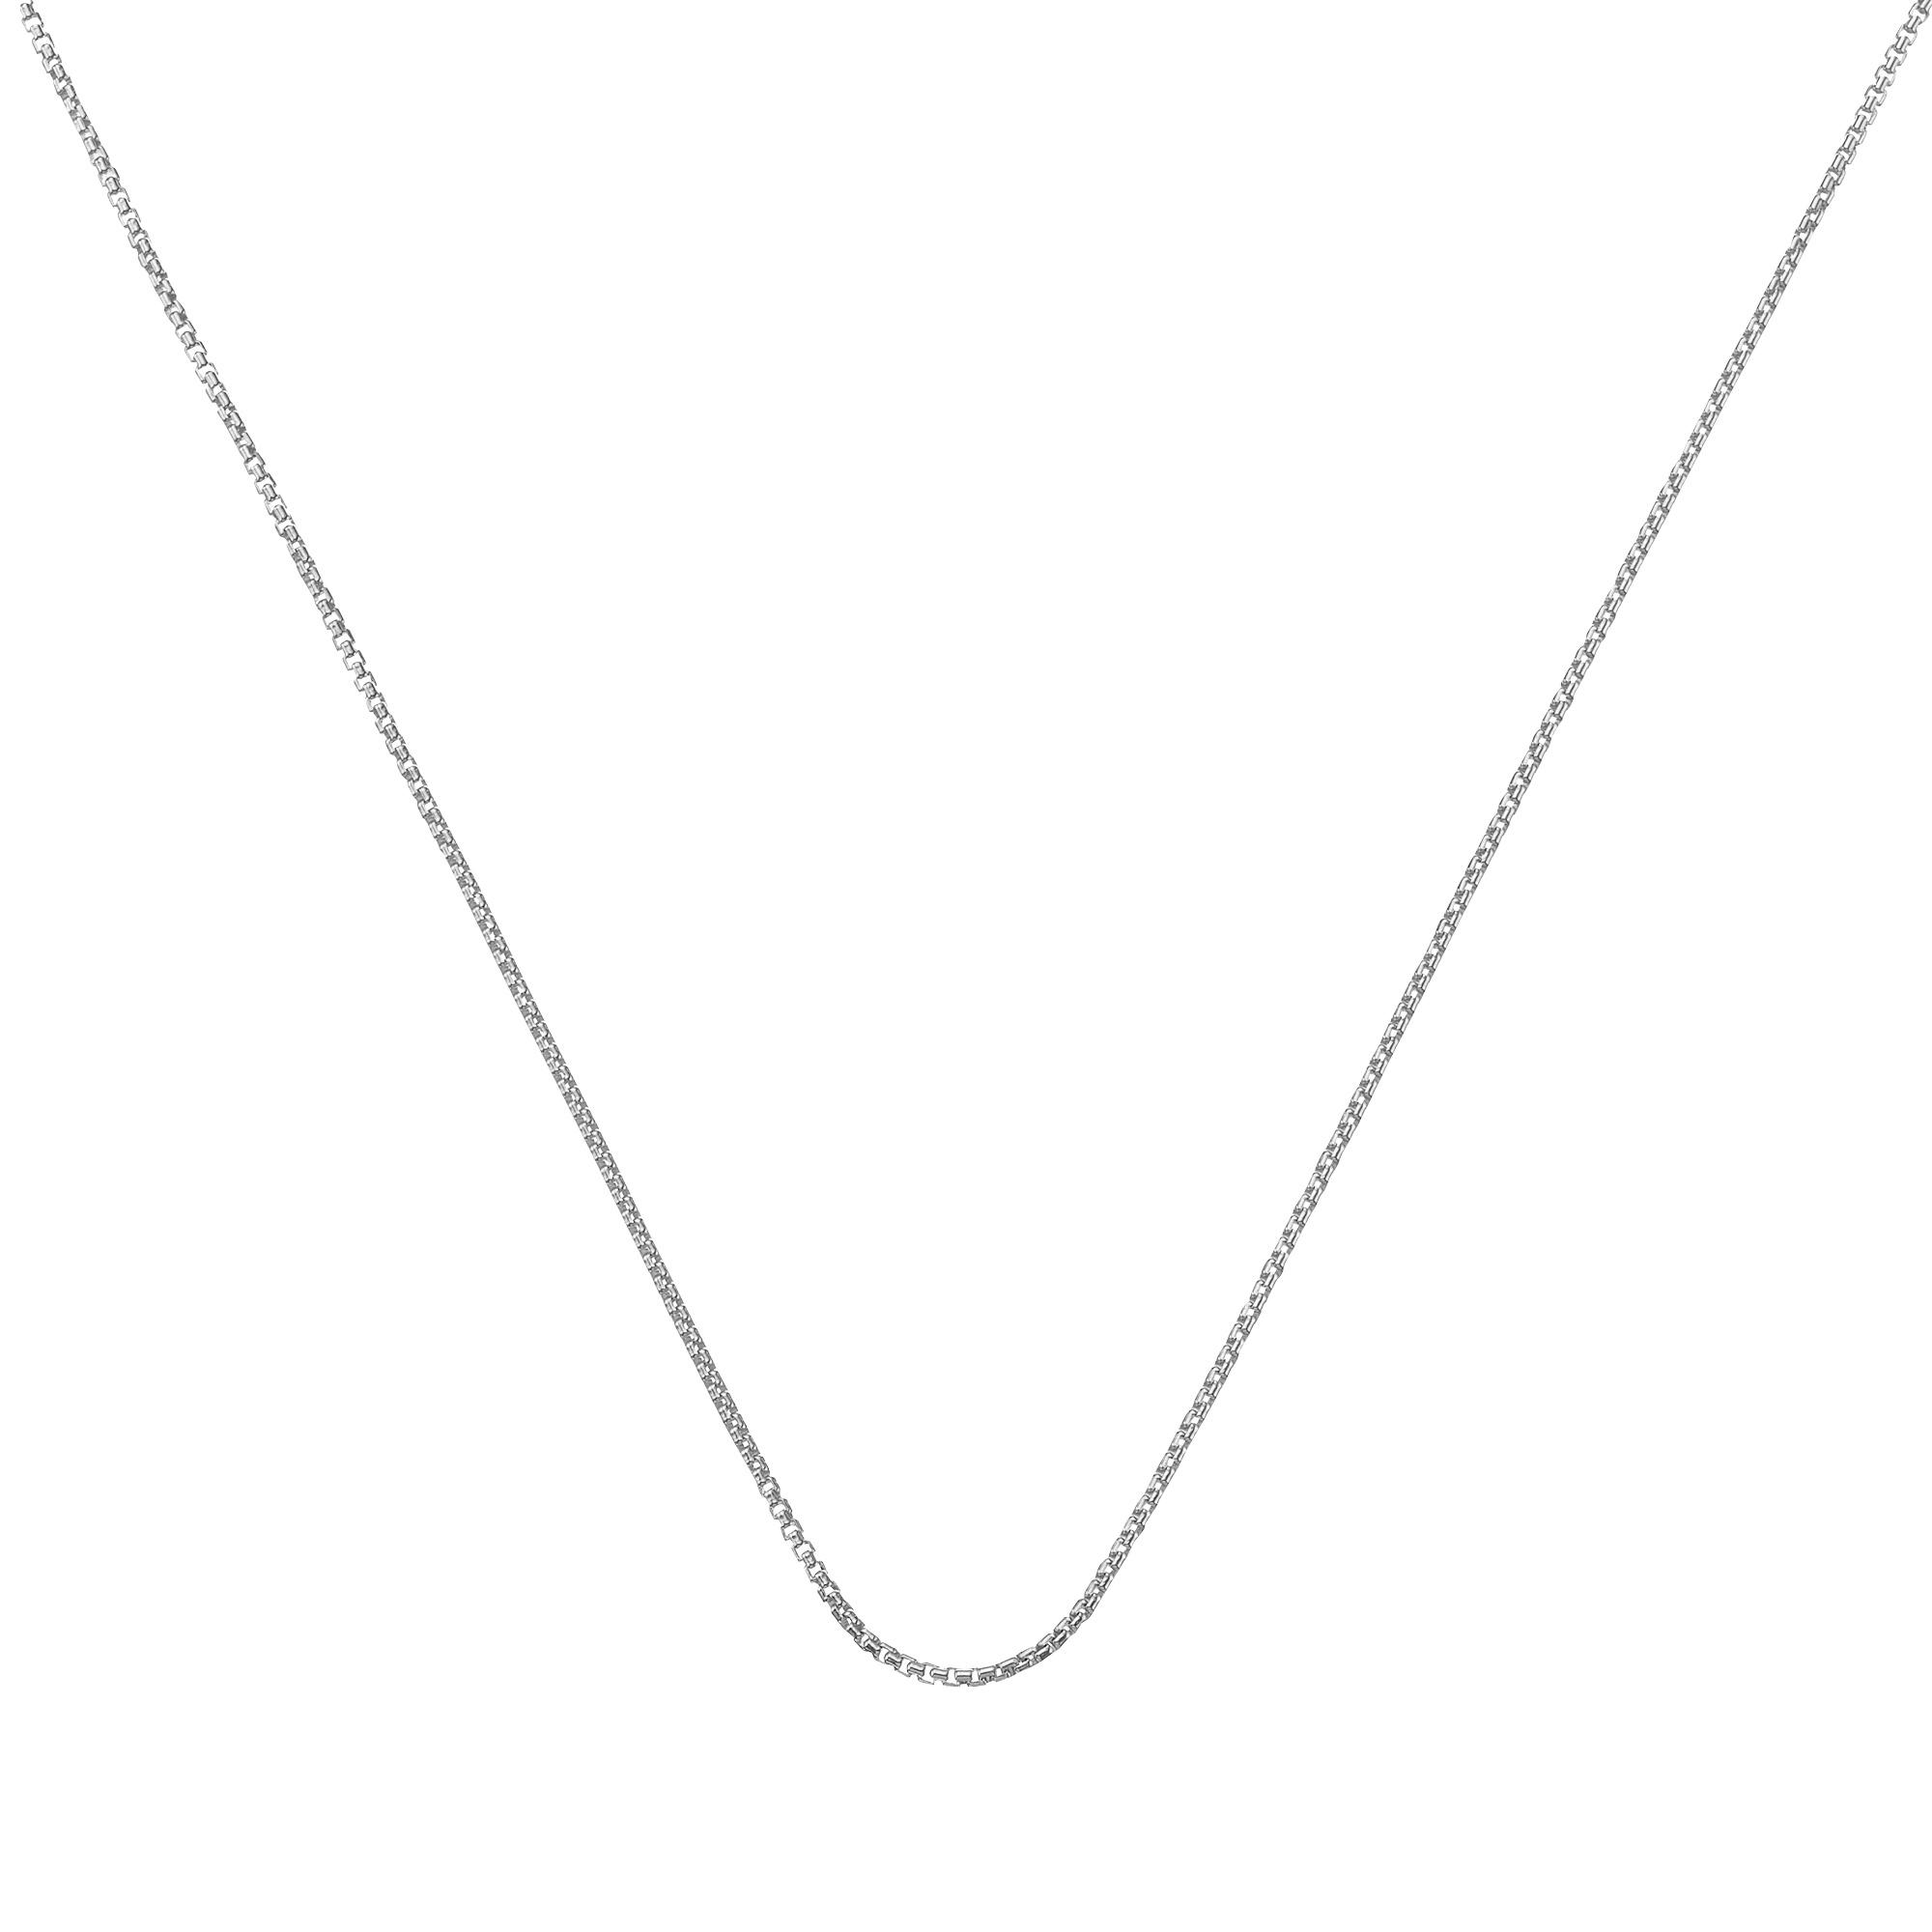 Base item